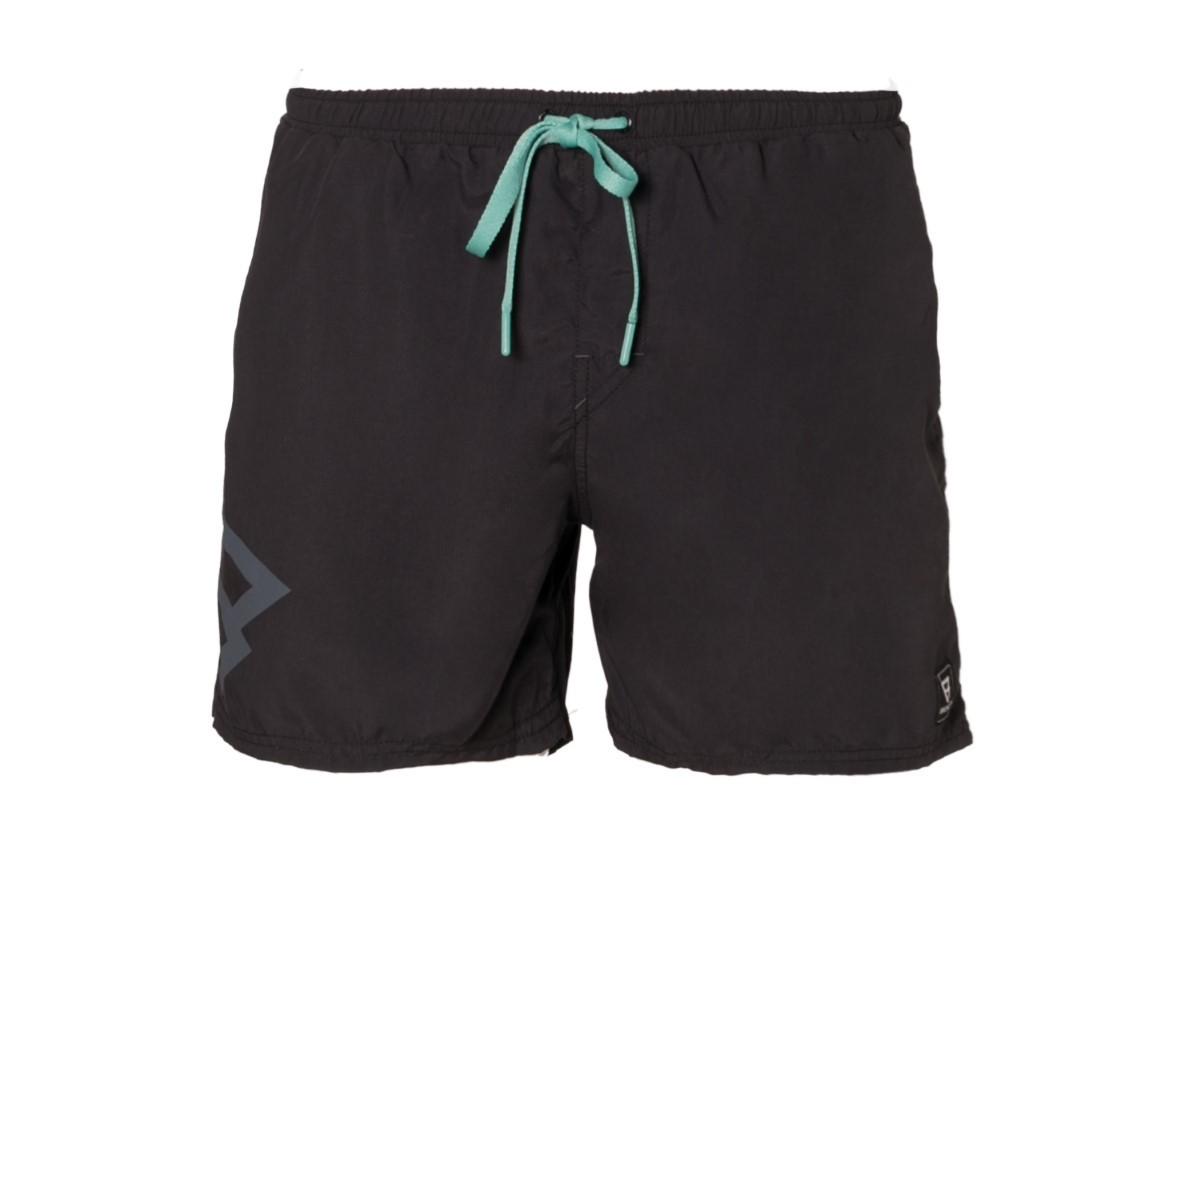 Brunotti Tinus Mens Shorts 2019